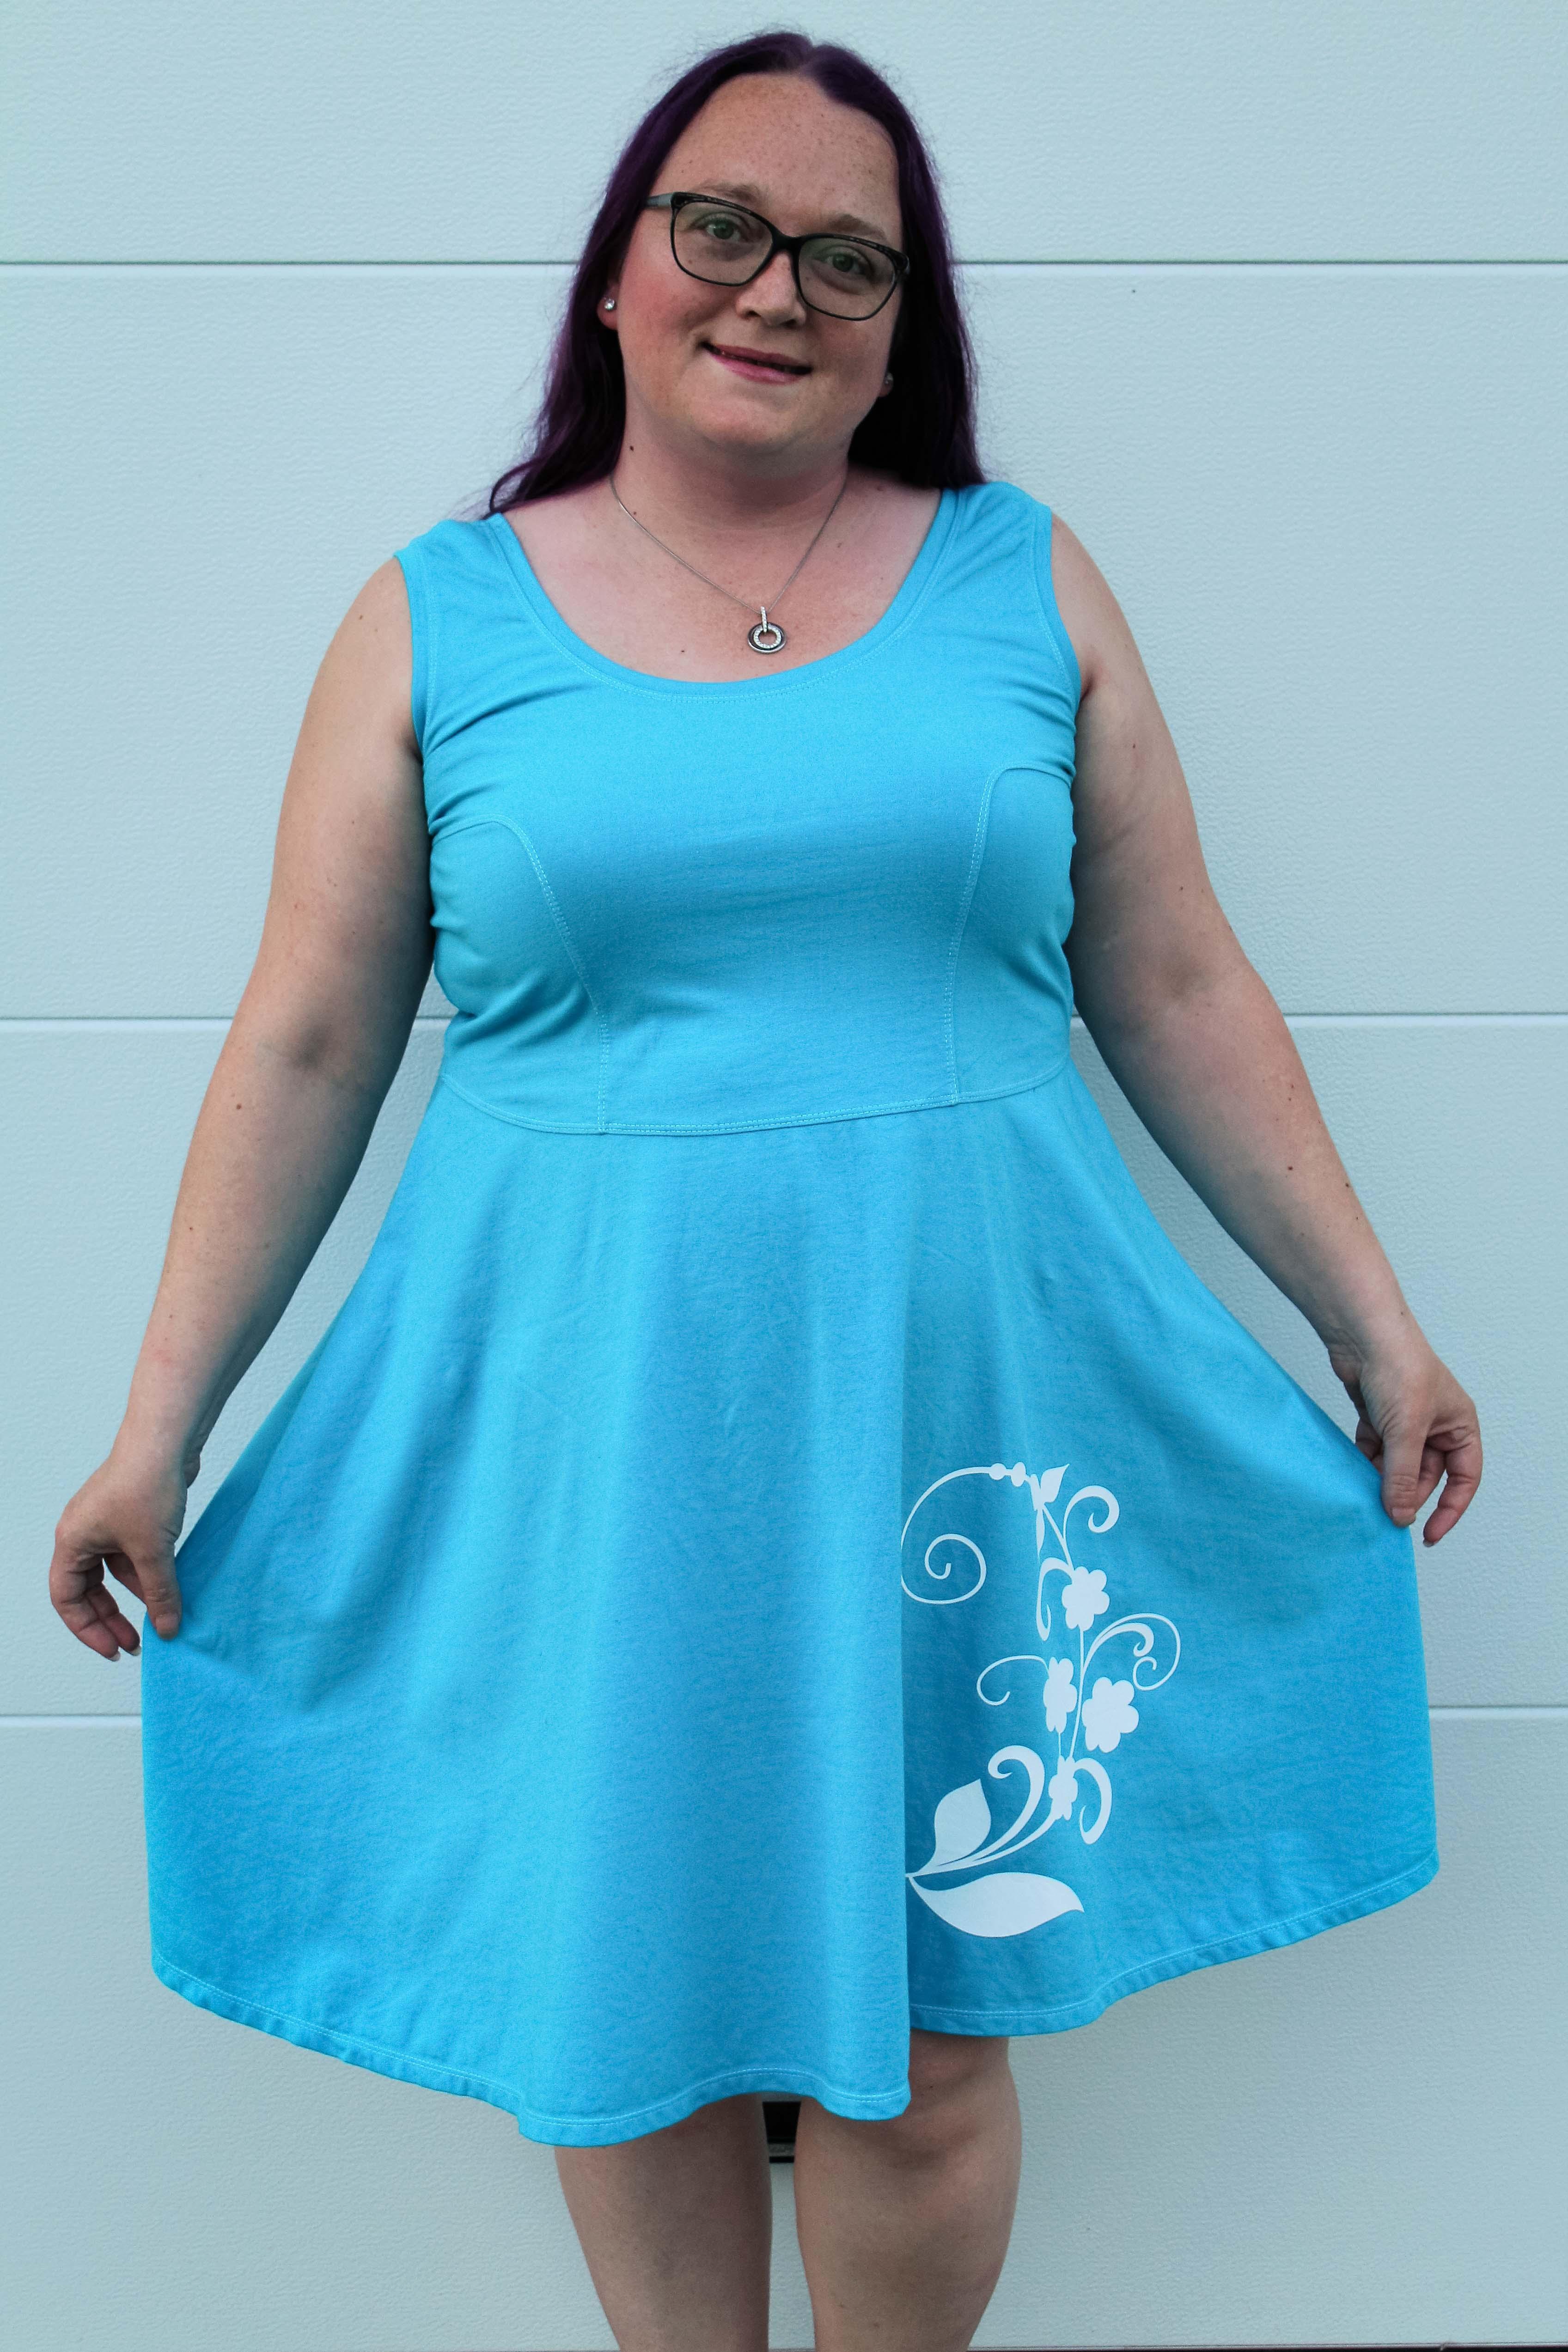 IMG_7641 5oo4 Rosanna size 1XLFBA